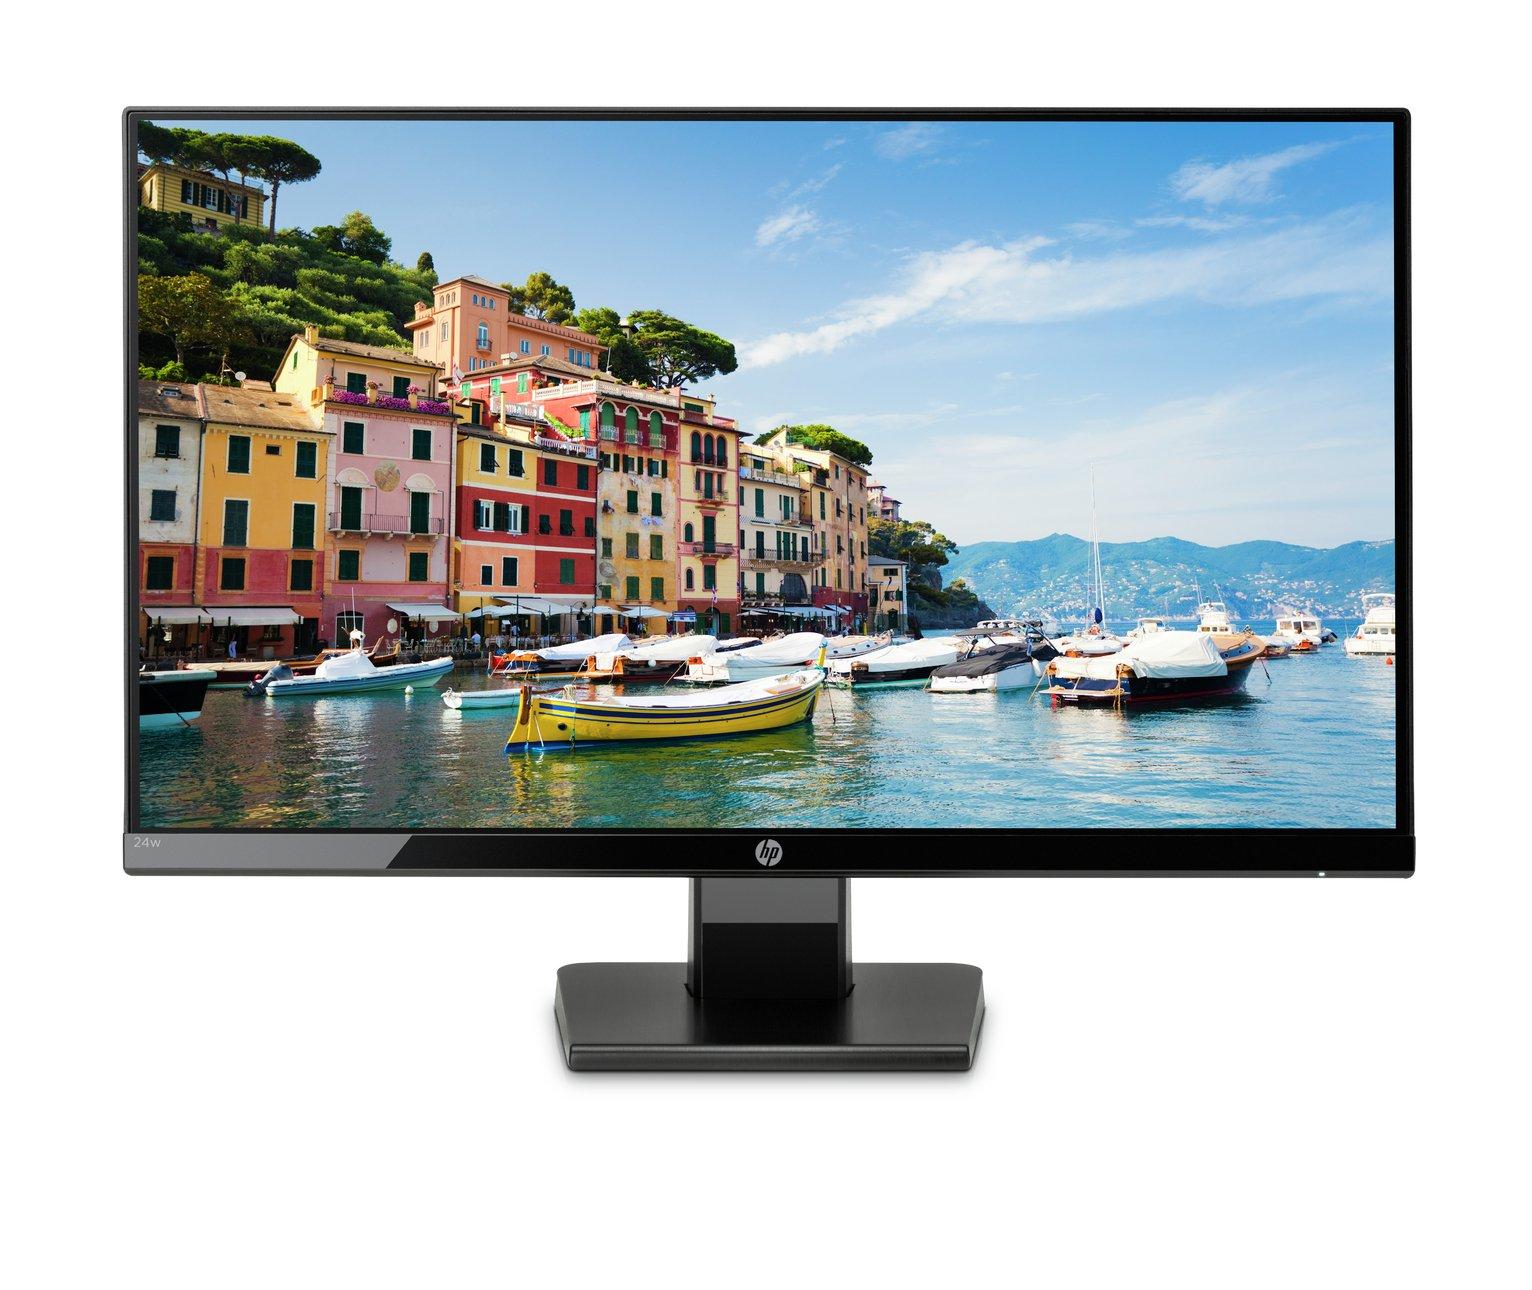 HP 24w 24 Inch FHD IPS Monitor